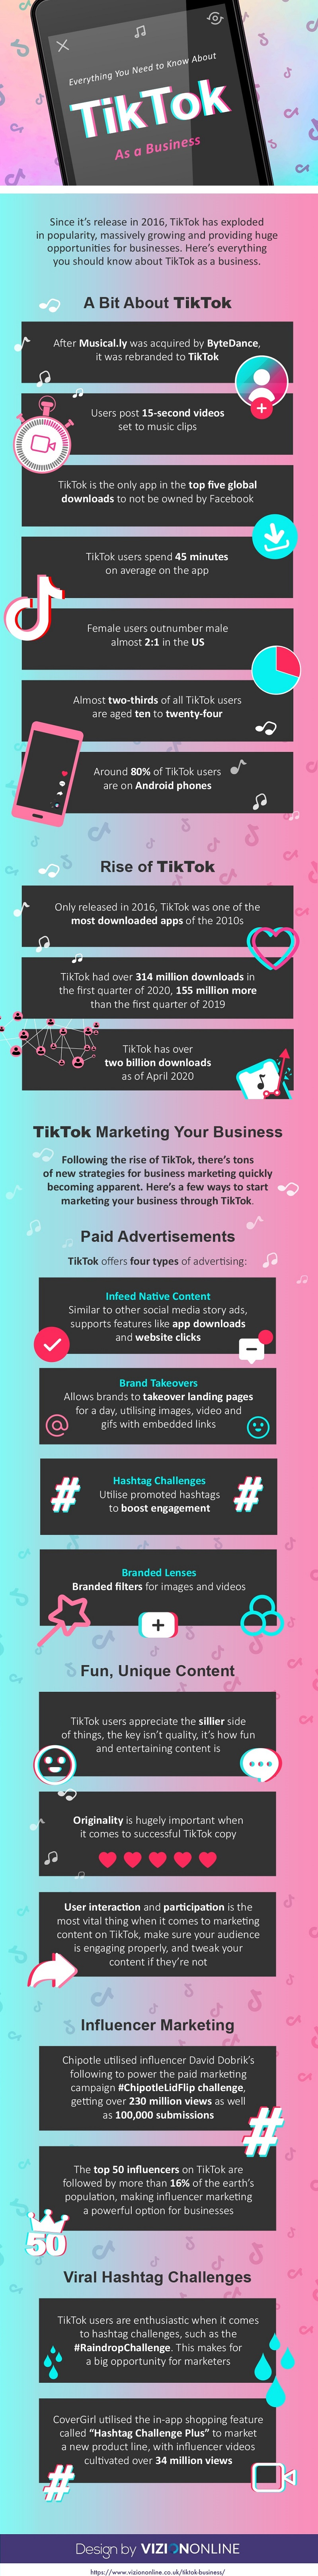 TikTok infographic